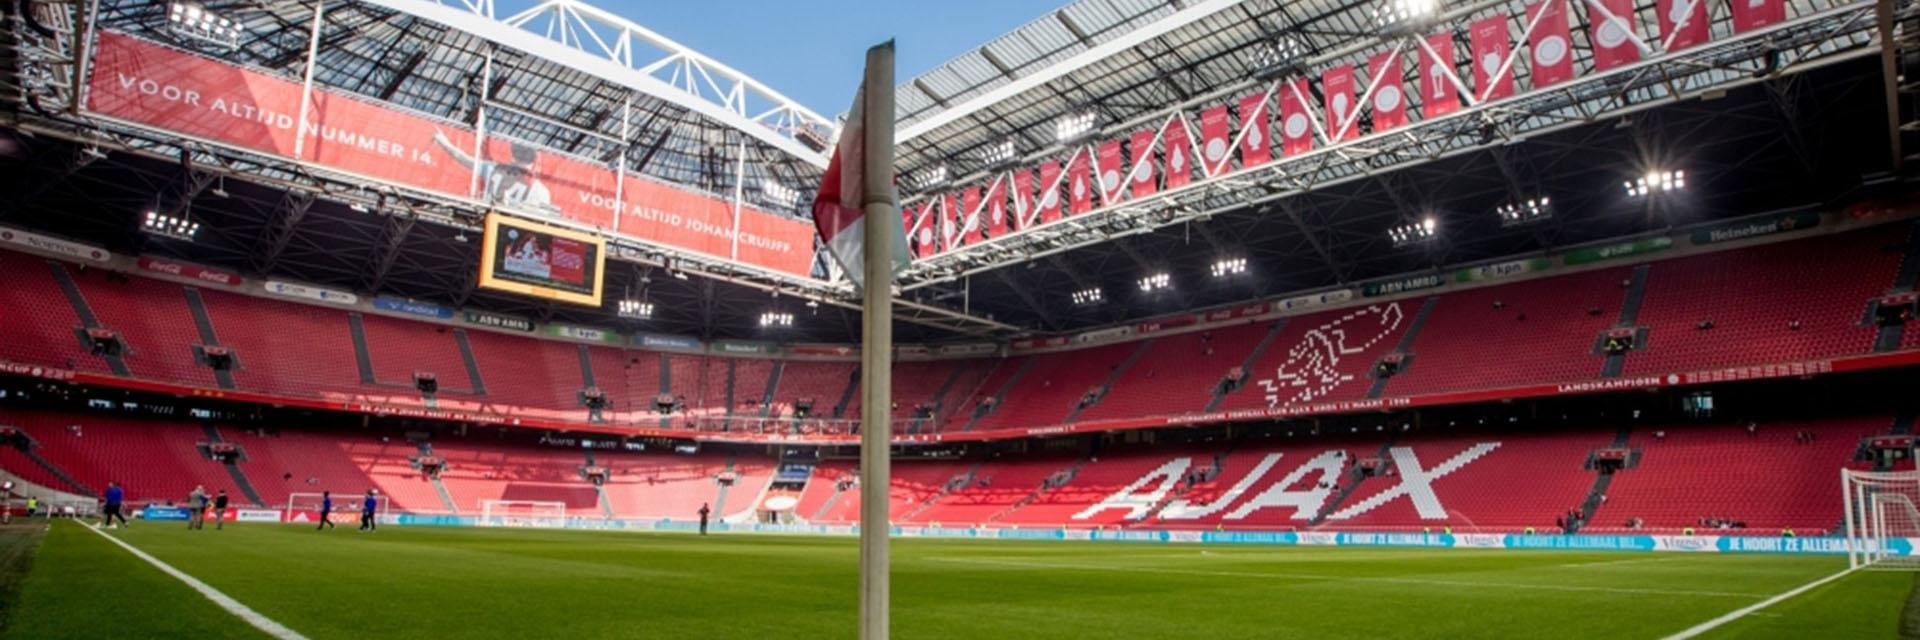 AFC Ajax - Sparta Rotterdam, 0 Januaryat 13:30